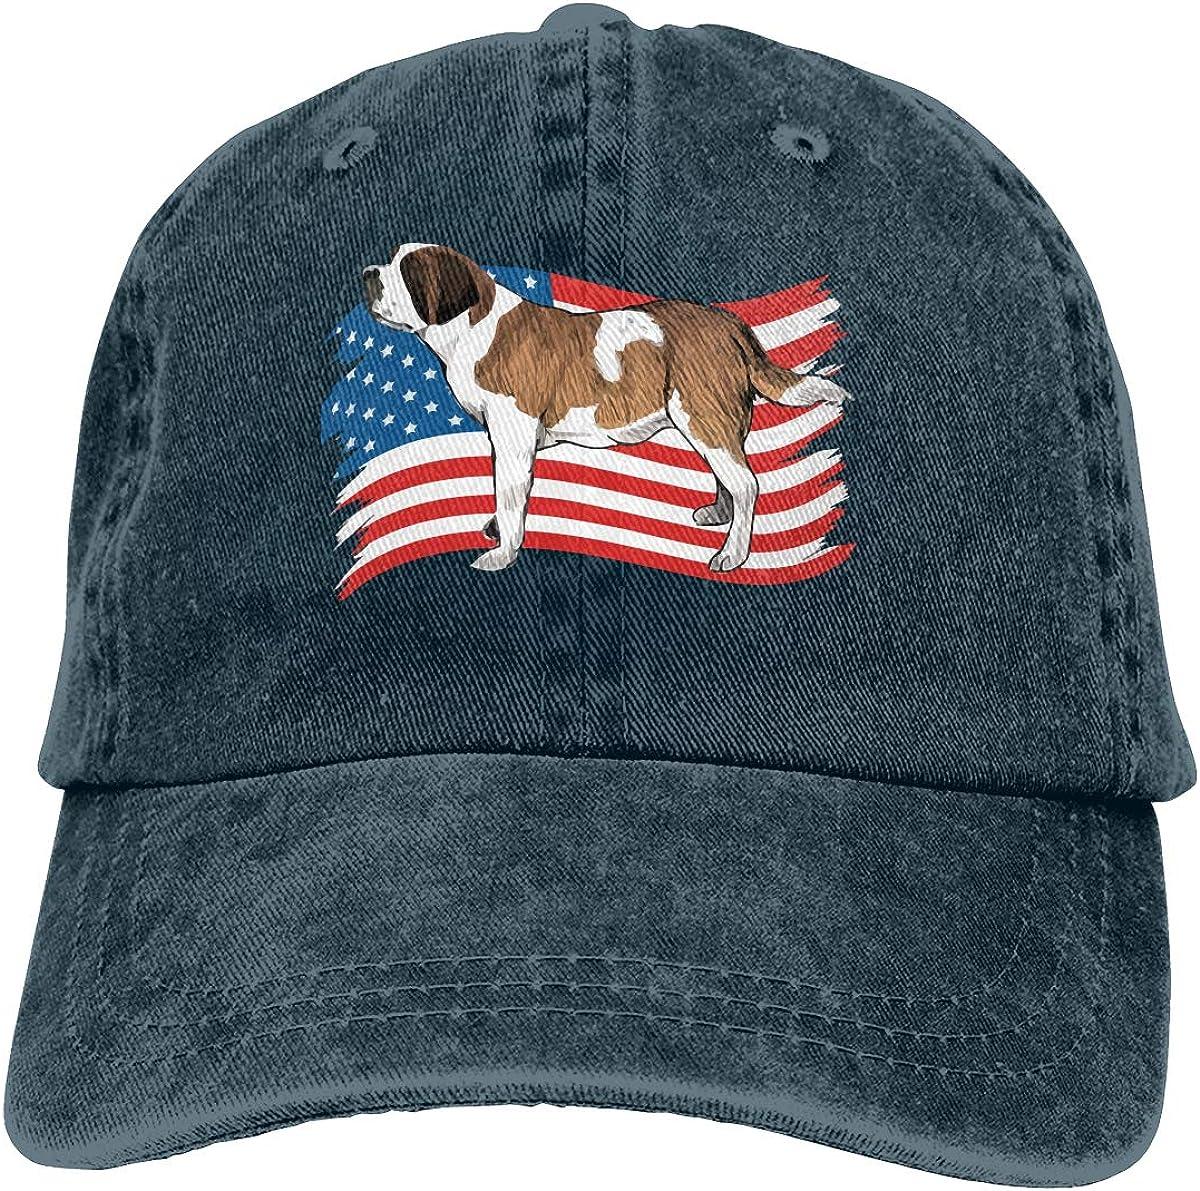 TBVS 77 Men Women Distressed Denim Fabric Baseball Cap Saint Bernard Dog USA Flag Adjustable Headwear